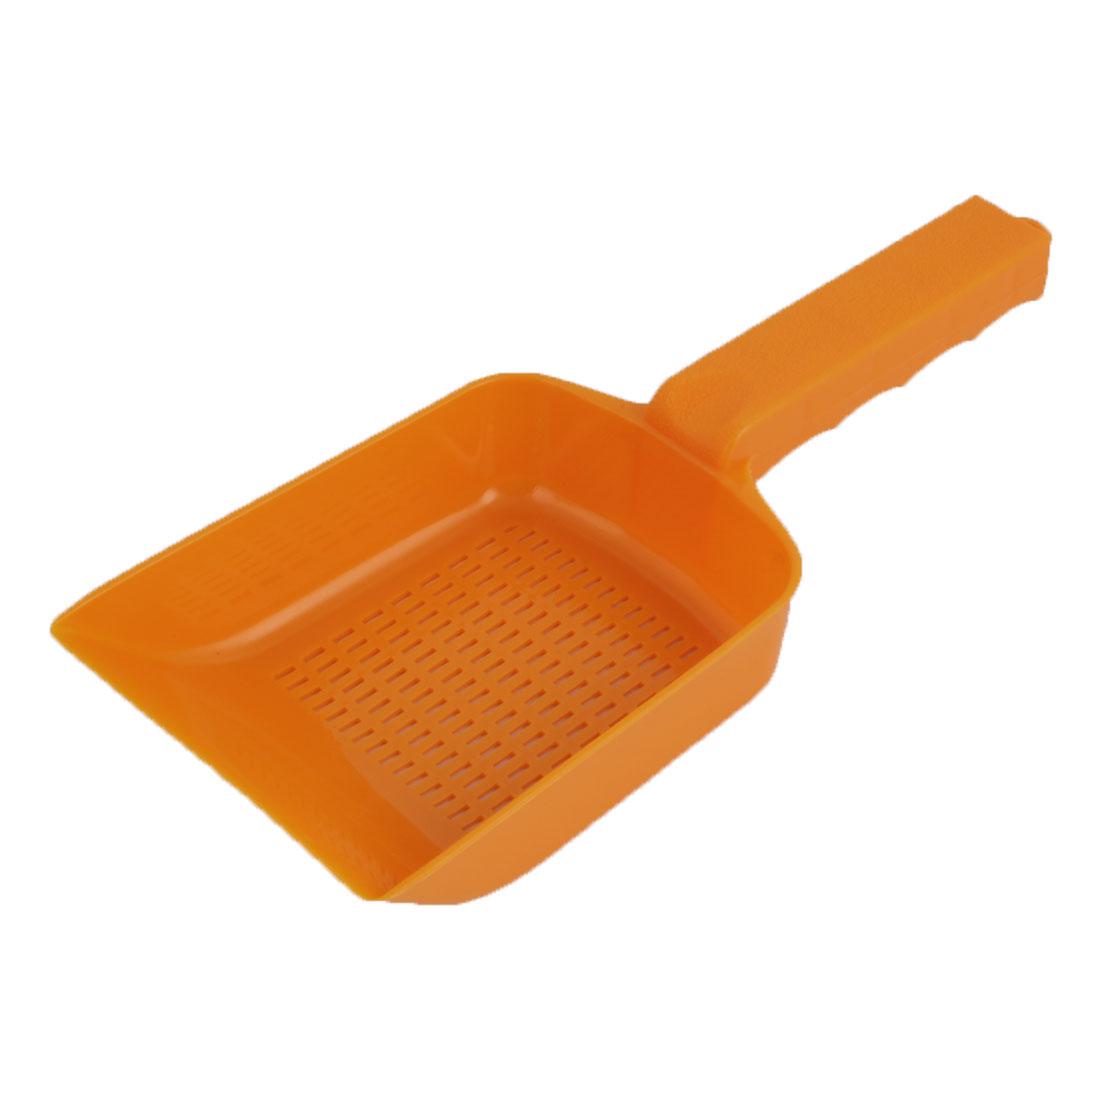 Fish Tank Plastic Multihole Shovel Sand Scraper Scoop Pan Poop Kit Orange